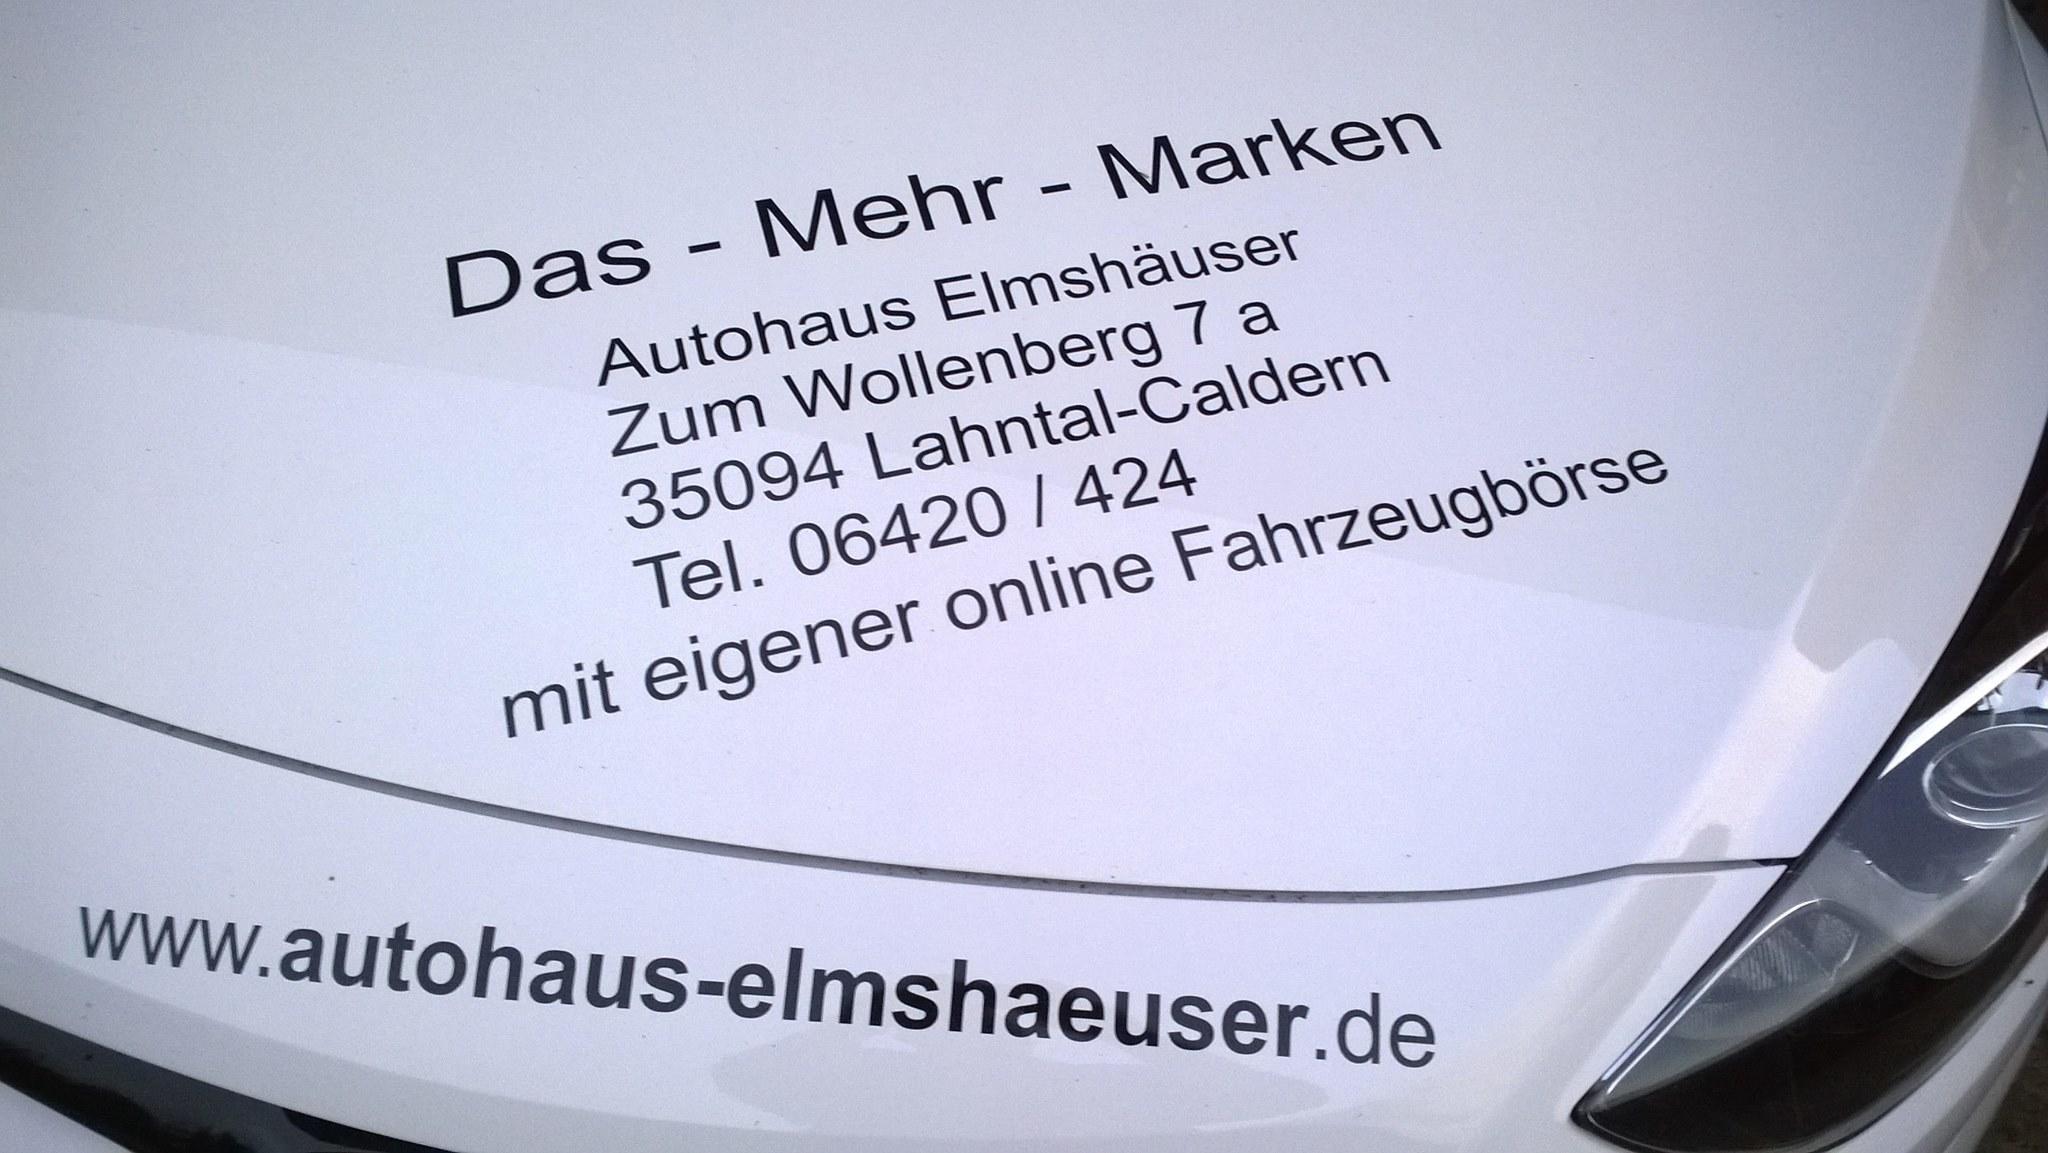 Autohaus Elmshäuser